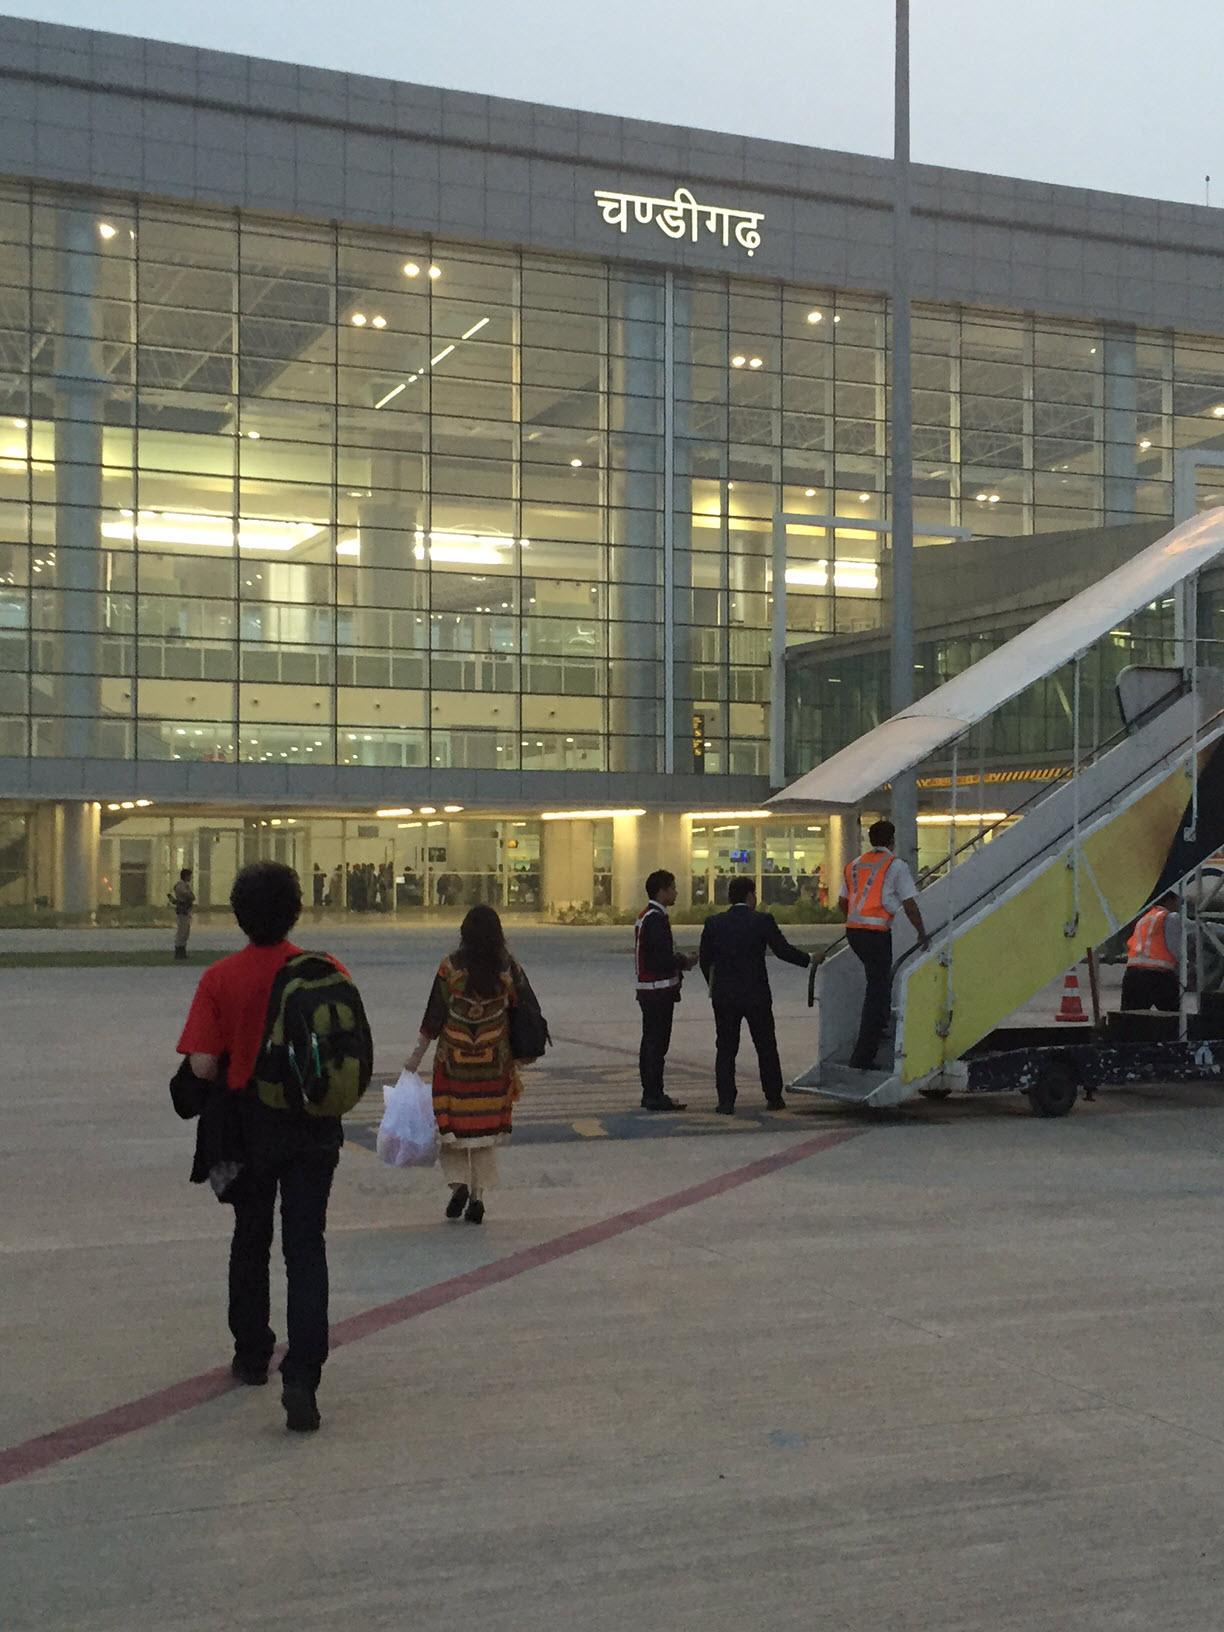 Vande Bharat flight carrying 86 passengers from Dubai landed in Chandigarh on Wednesday